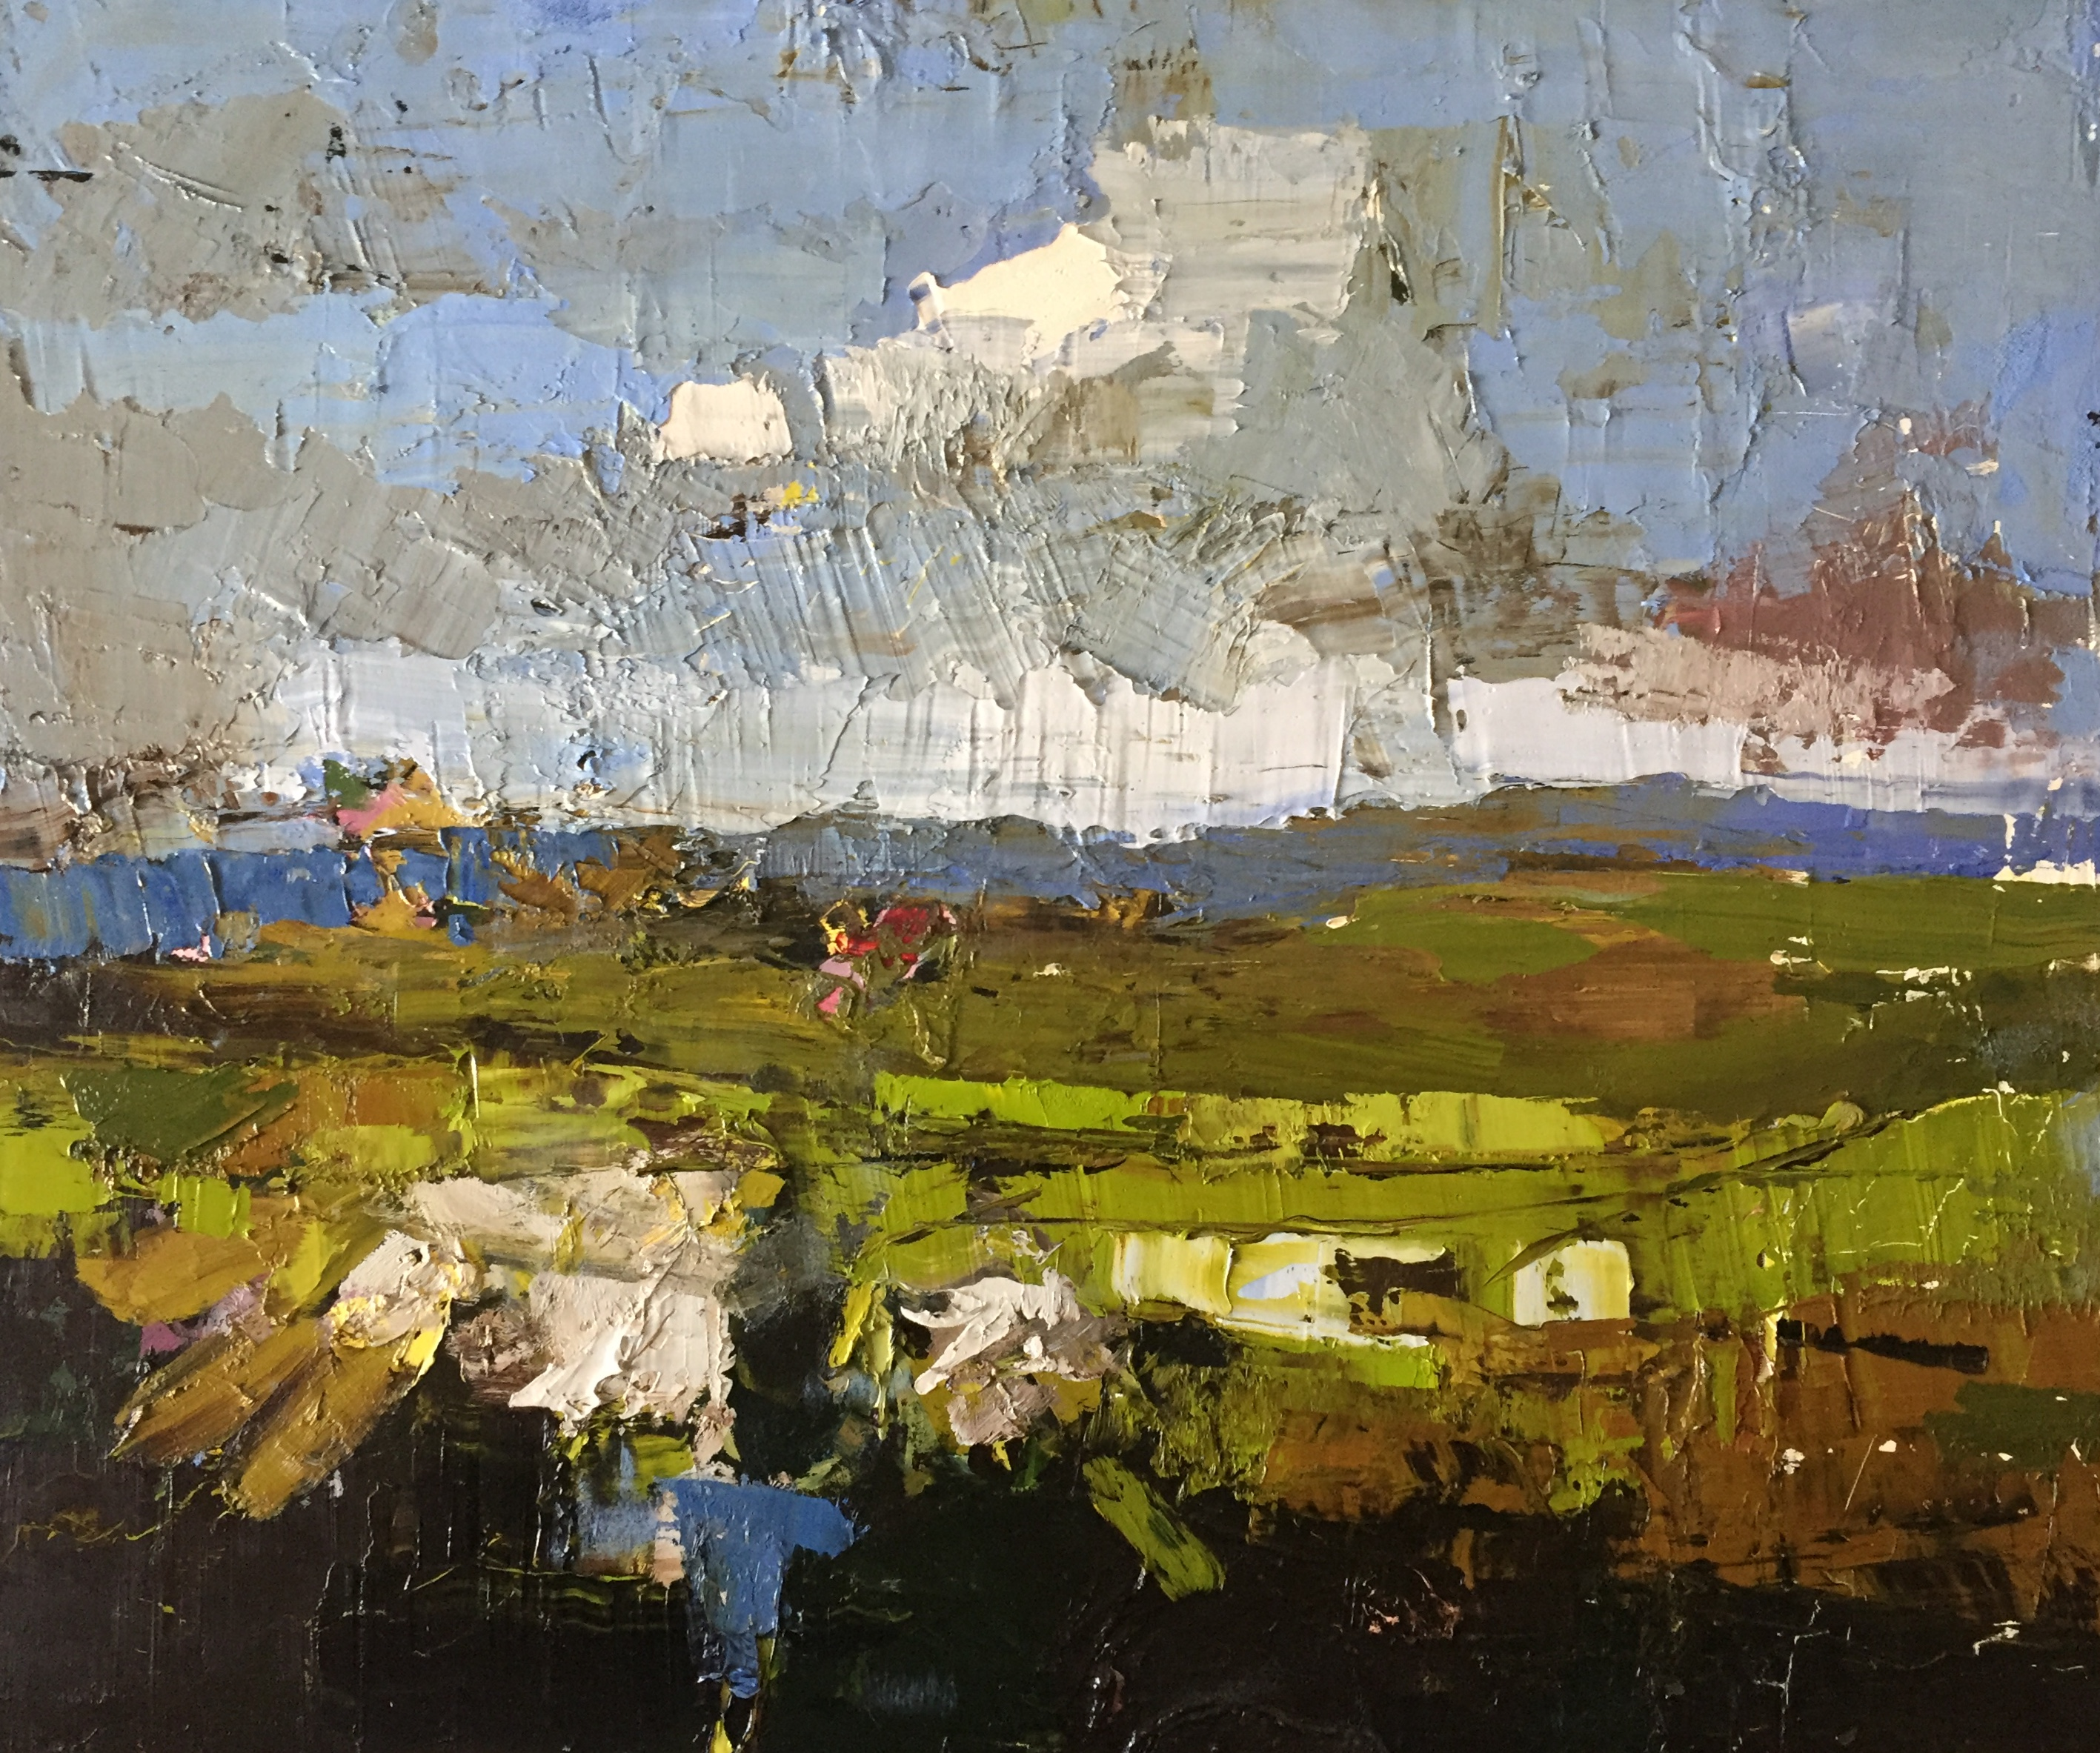 'Cashel Connemara', oil on panel, 51cm x 61cm, £8500